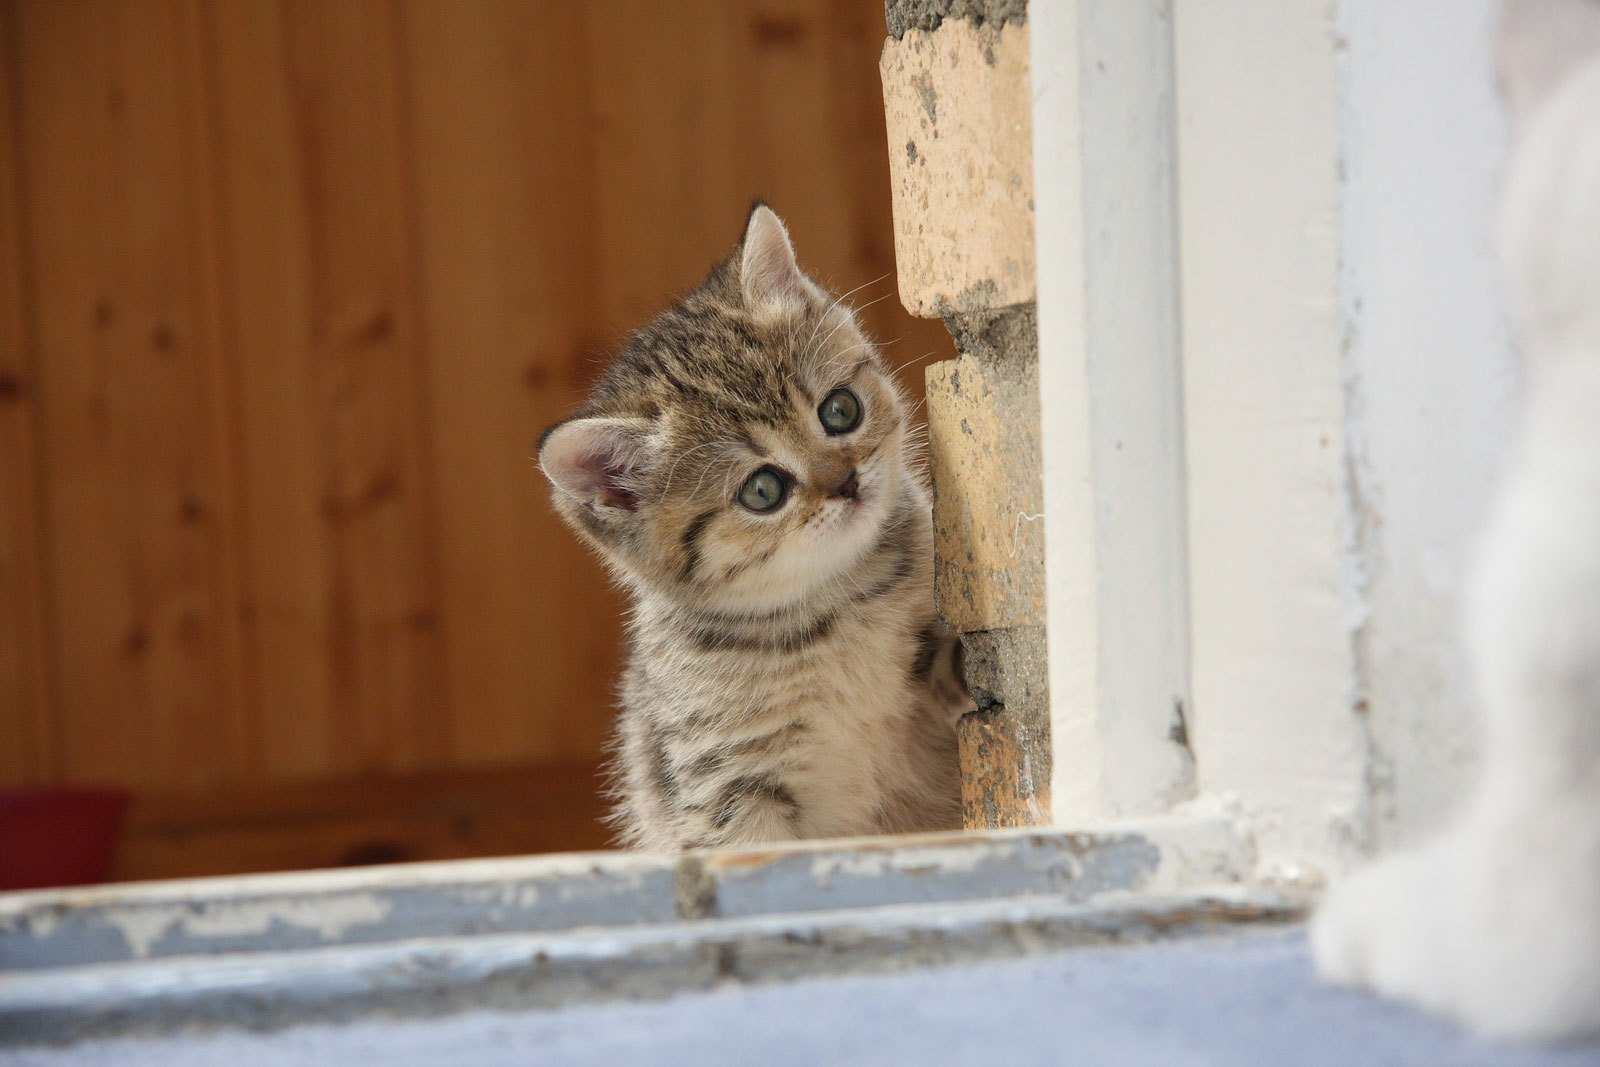 котята на окне kittens on the window  № 3063306 загрузить